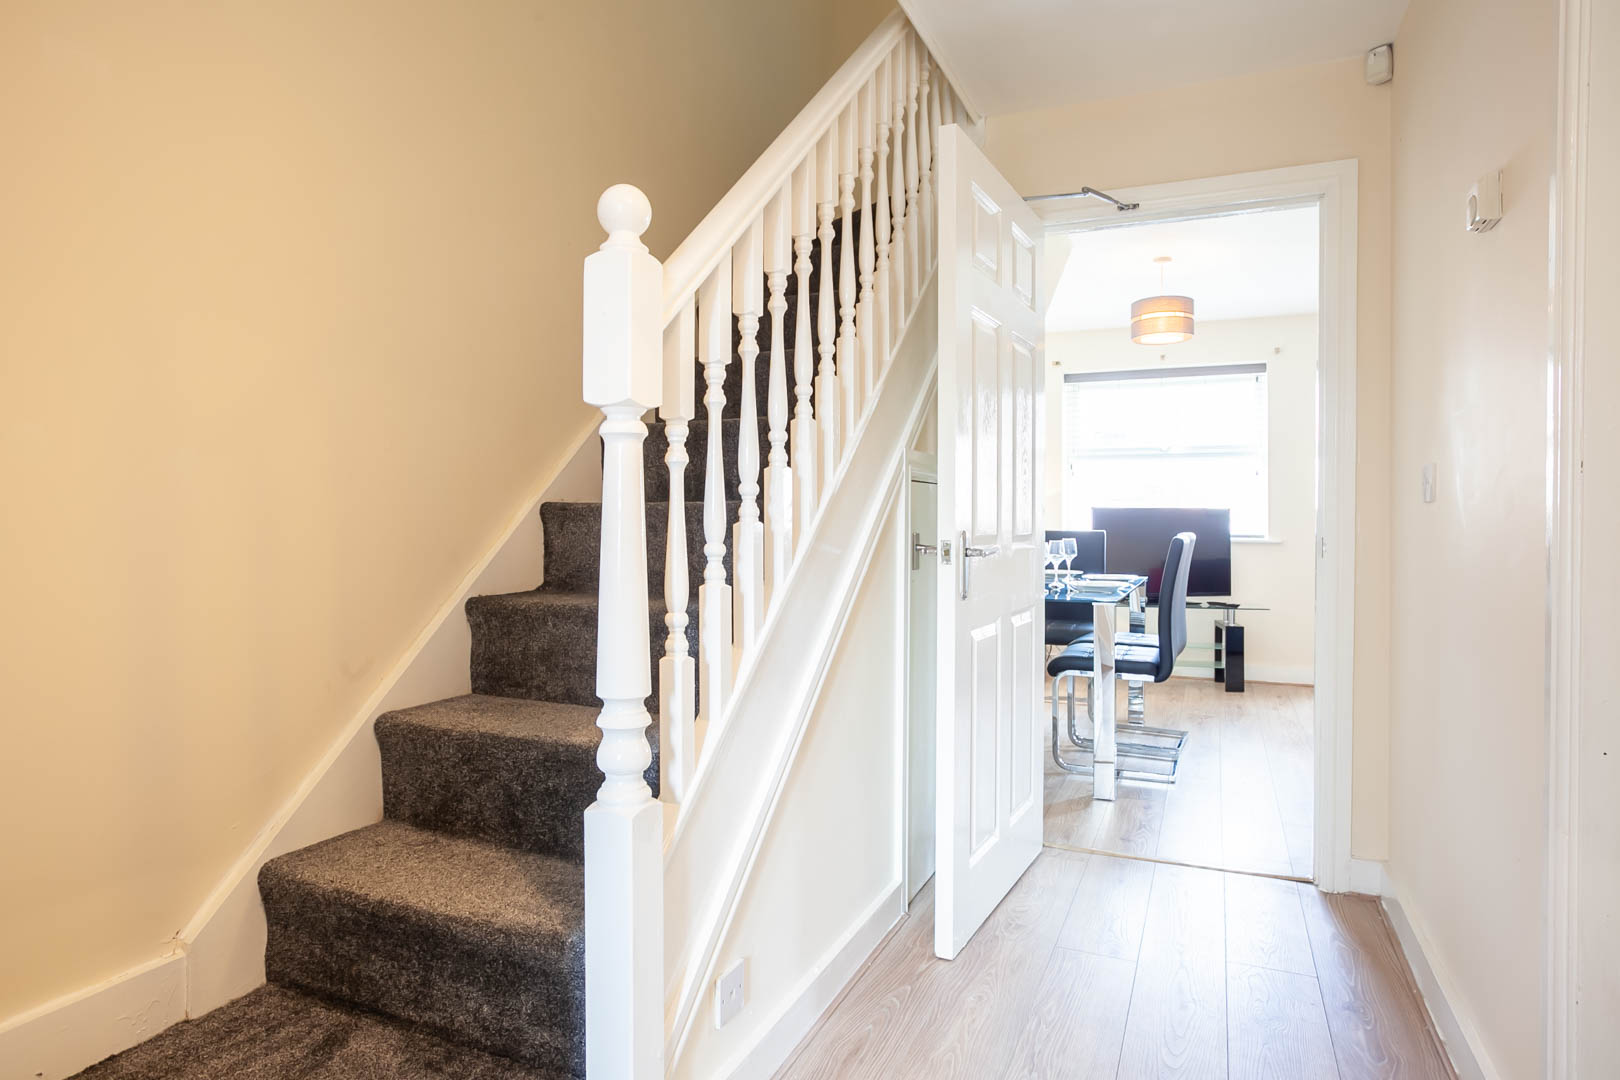 Hallway at St Marys House, Latchford, Warrington